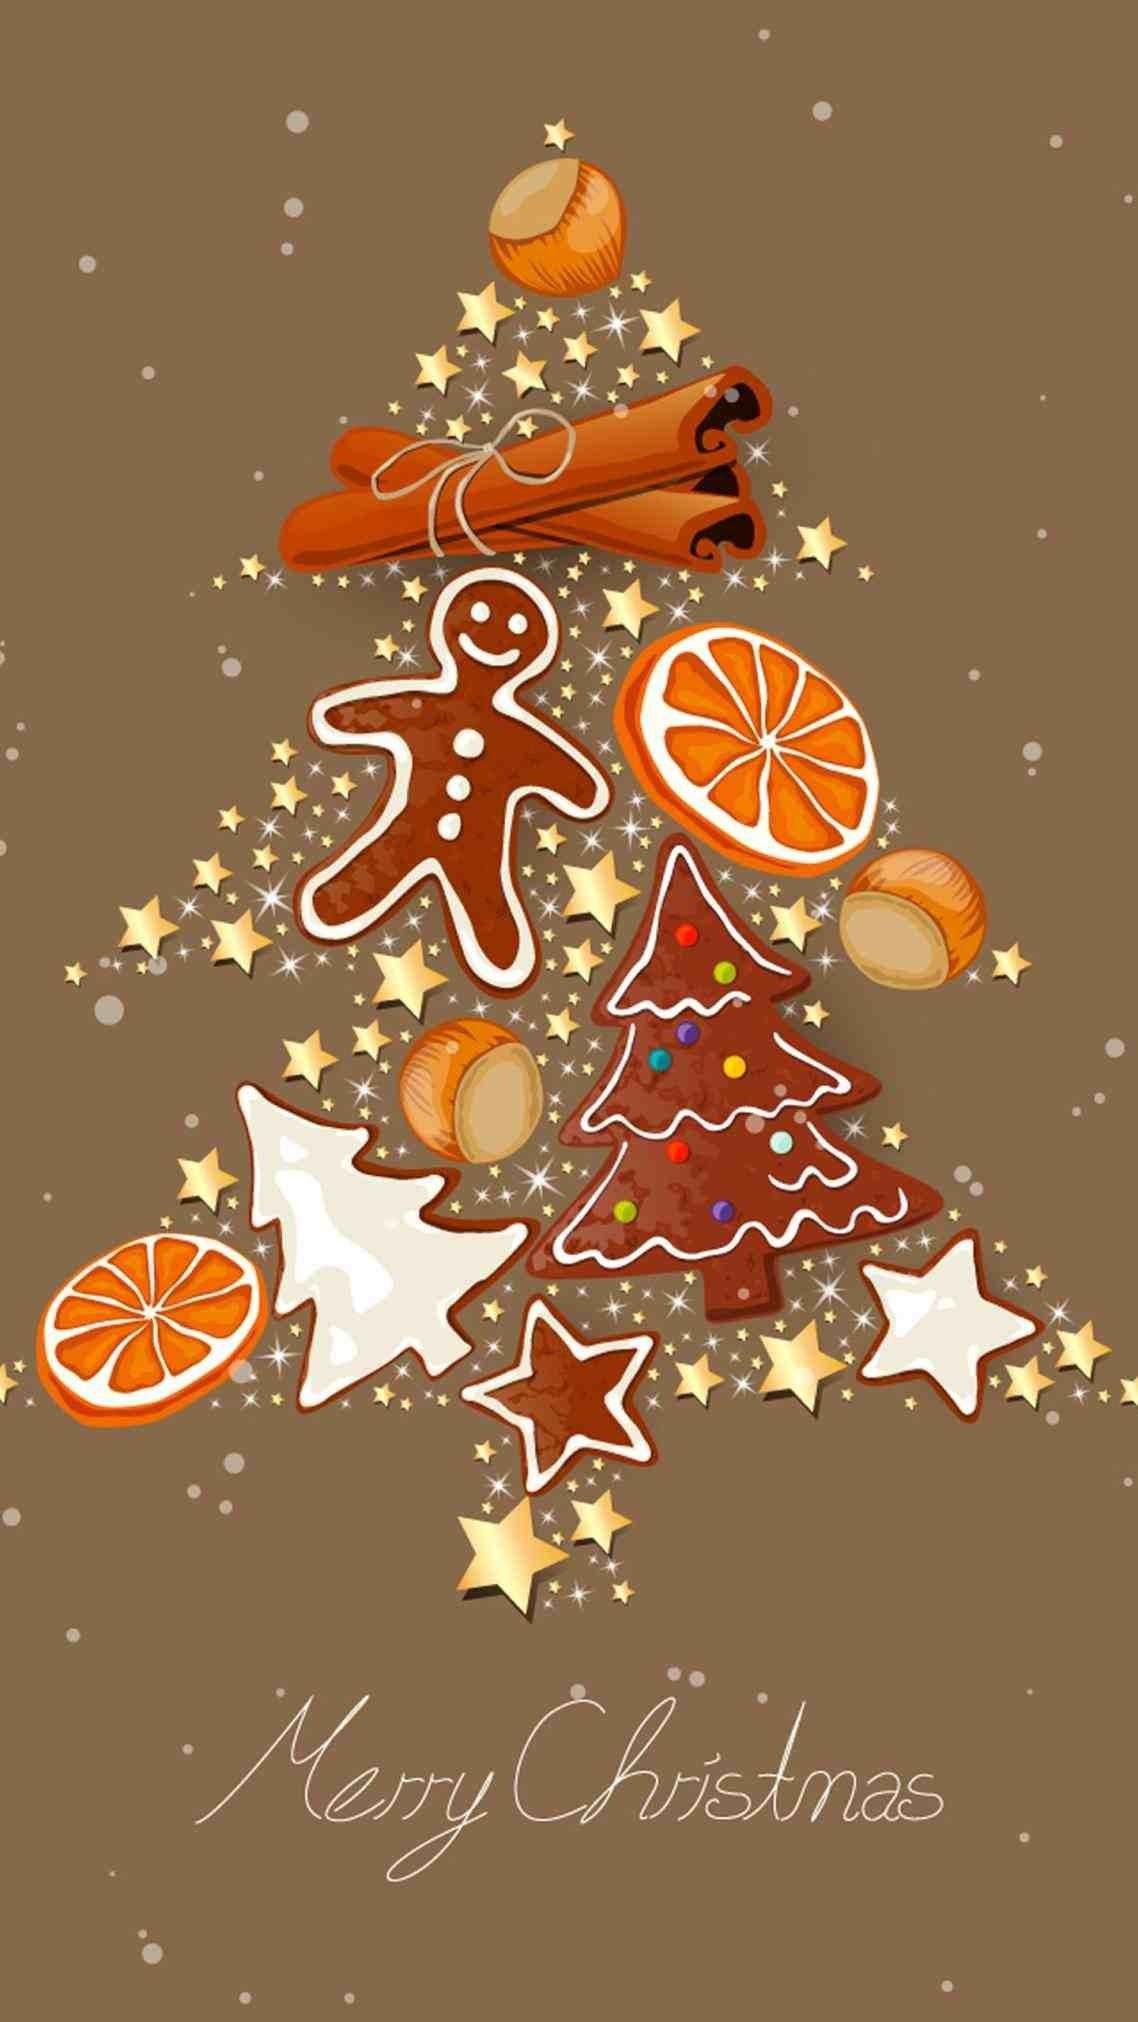 Christmas Snowman Wallpaper Cute - Iphone 6 Christmas Wallpaper Hd , HD Wallpaper & Backgrounds